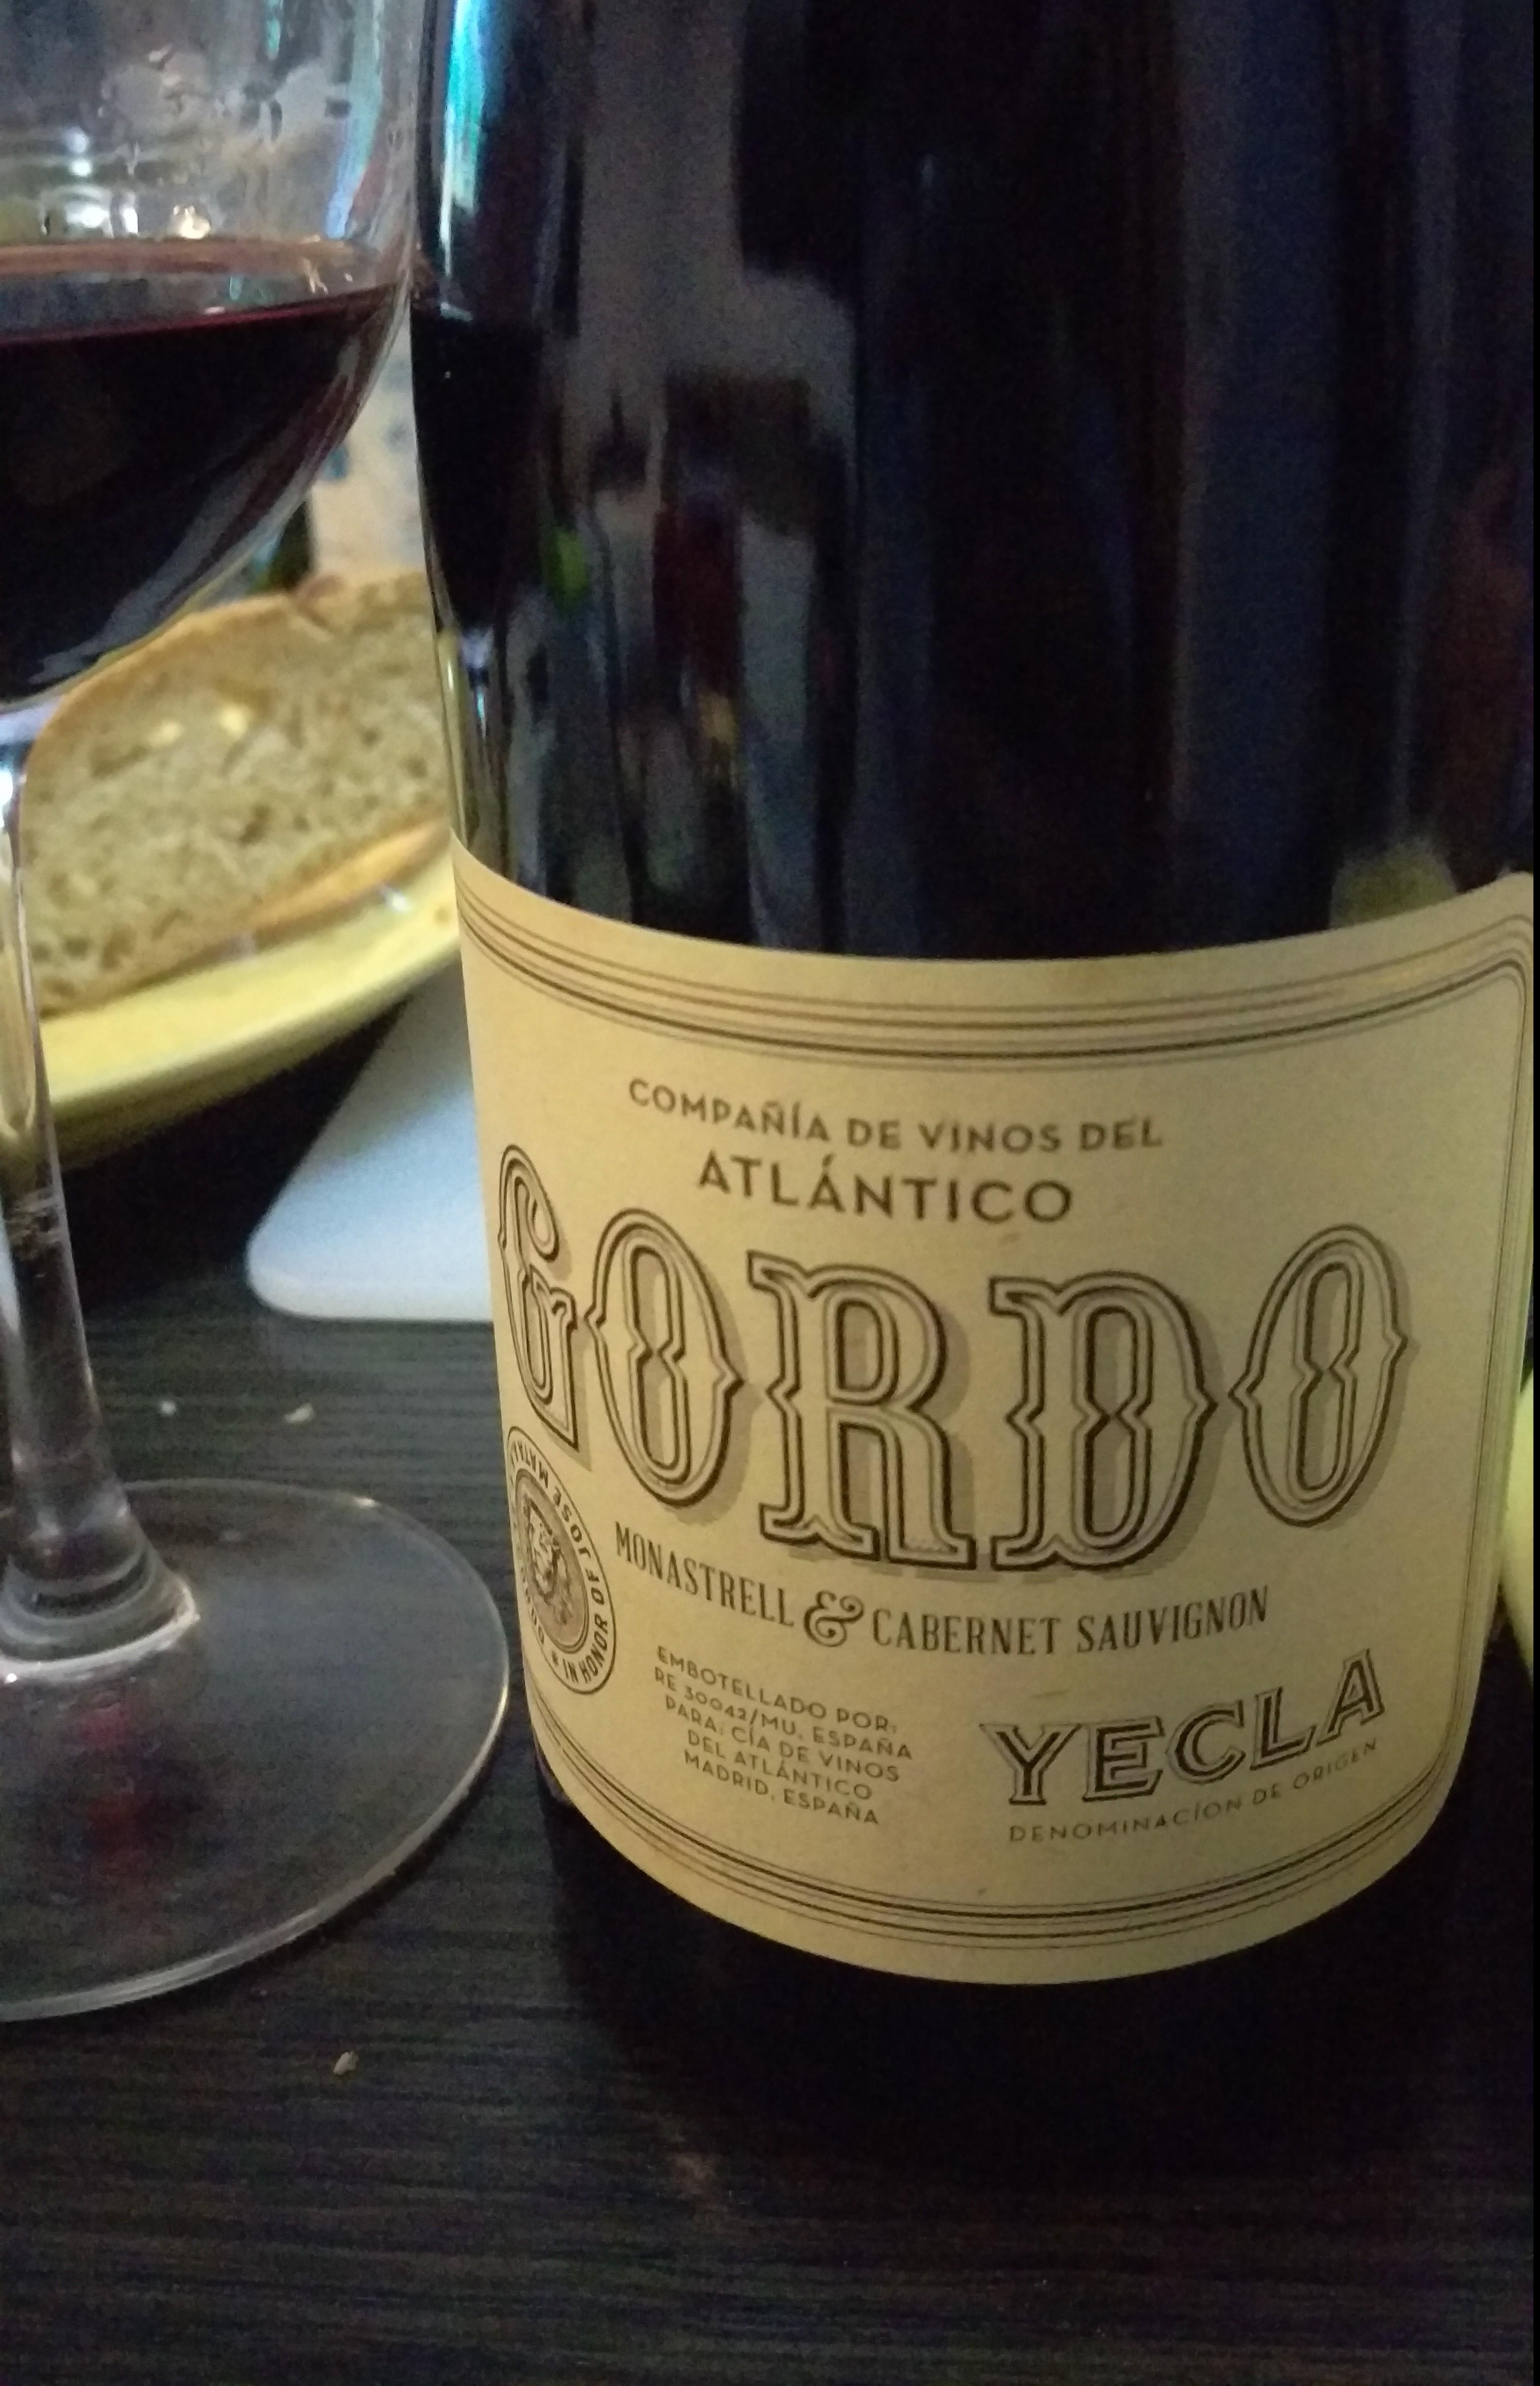 Gordo 2012, curioso nombre para un vino que pisa fuerte!